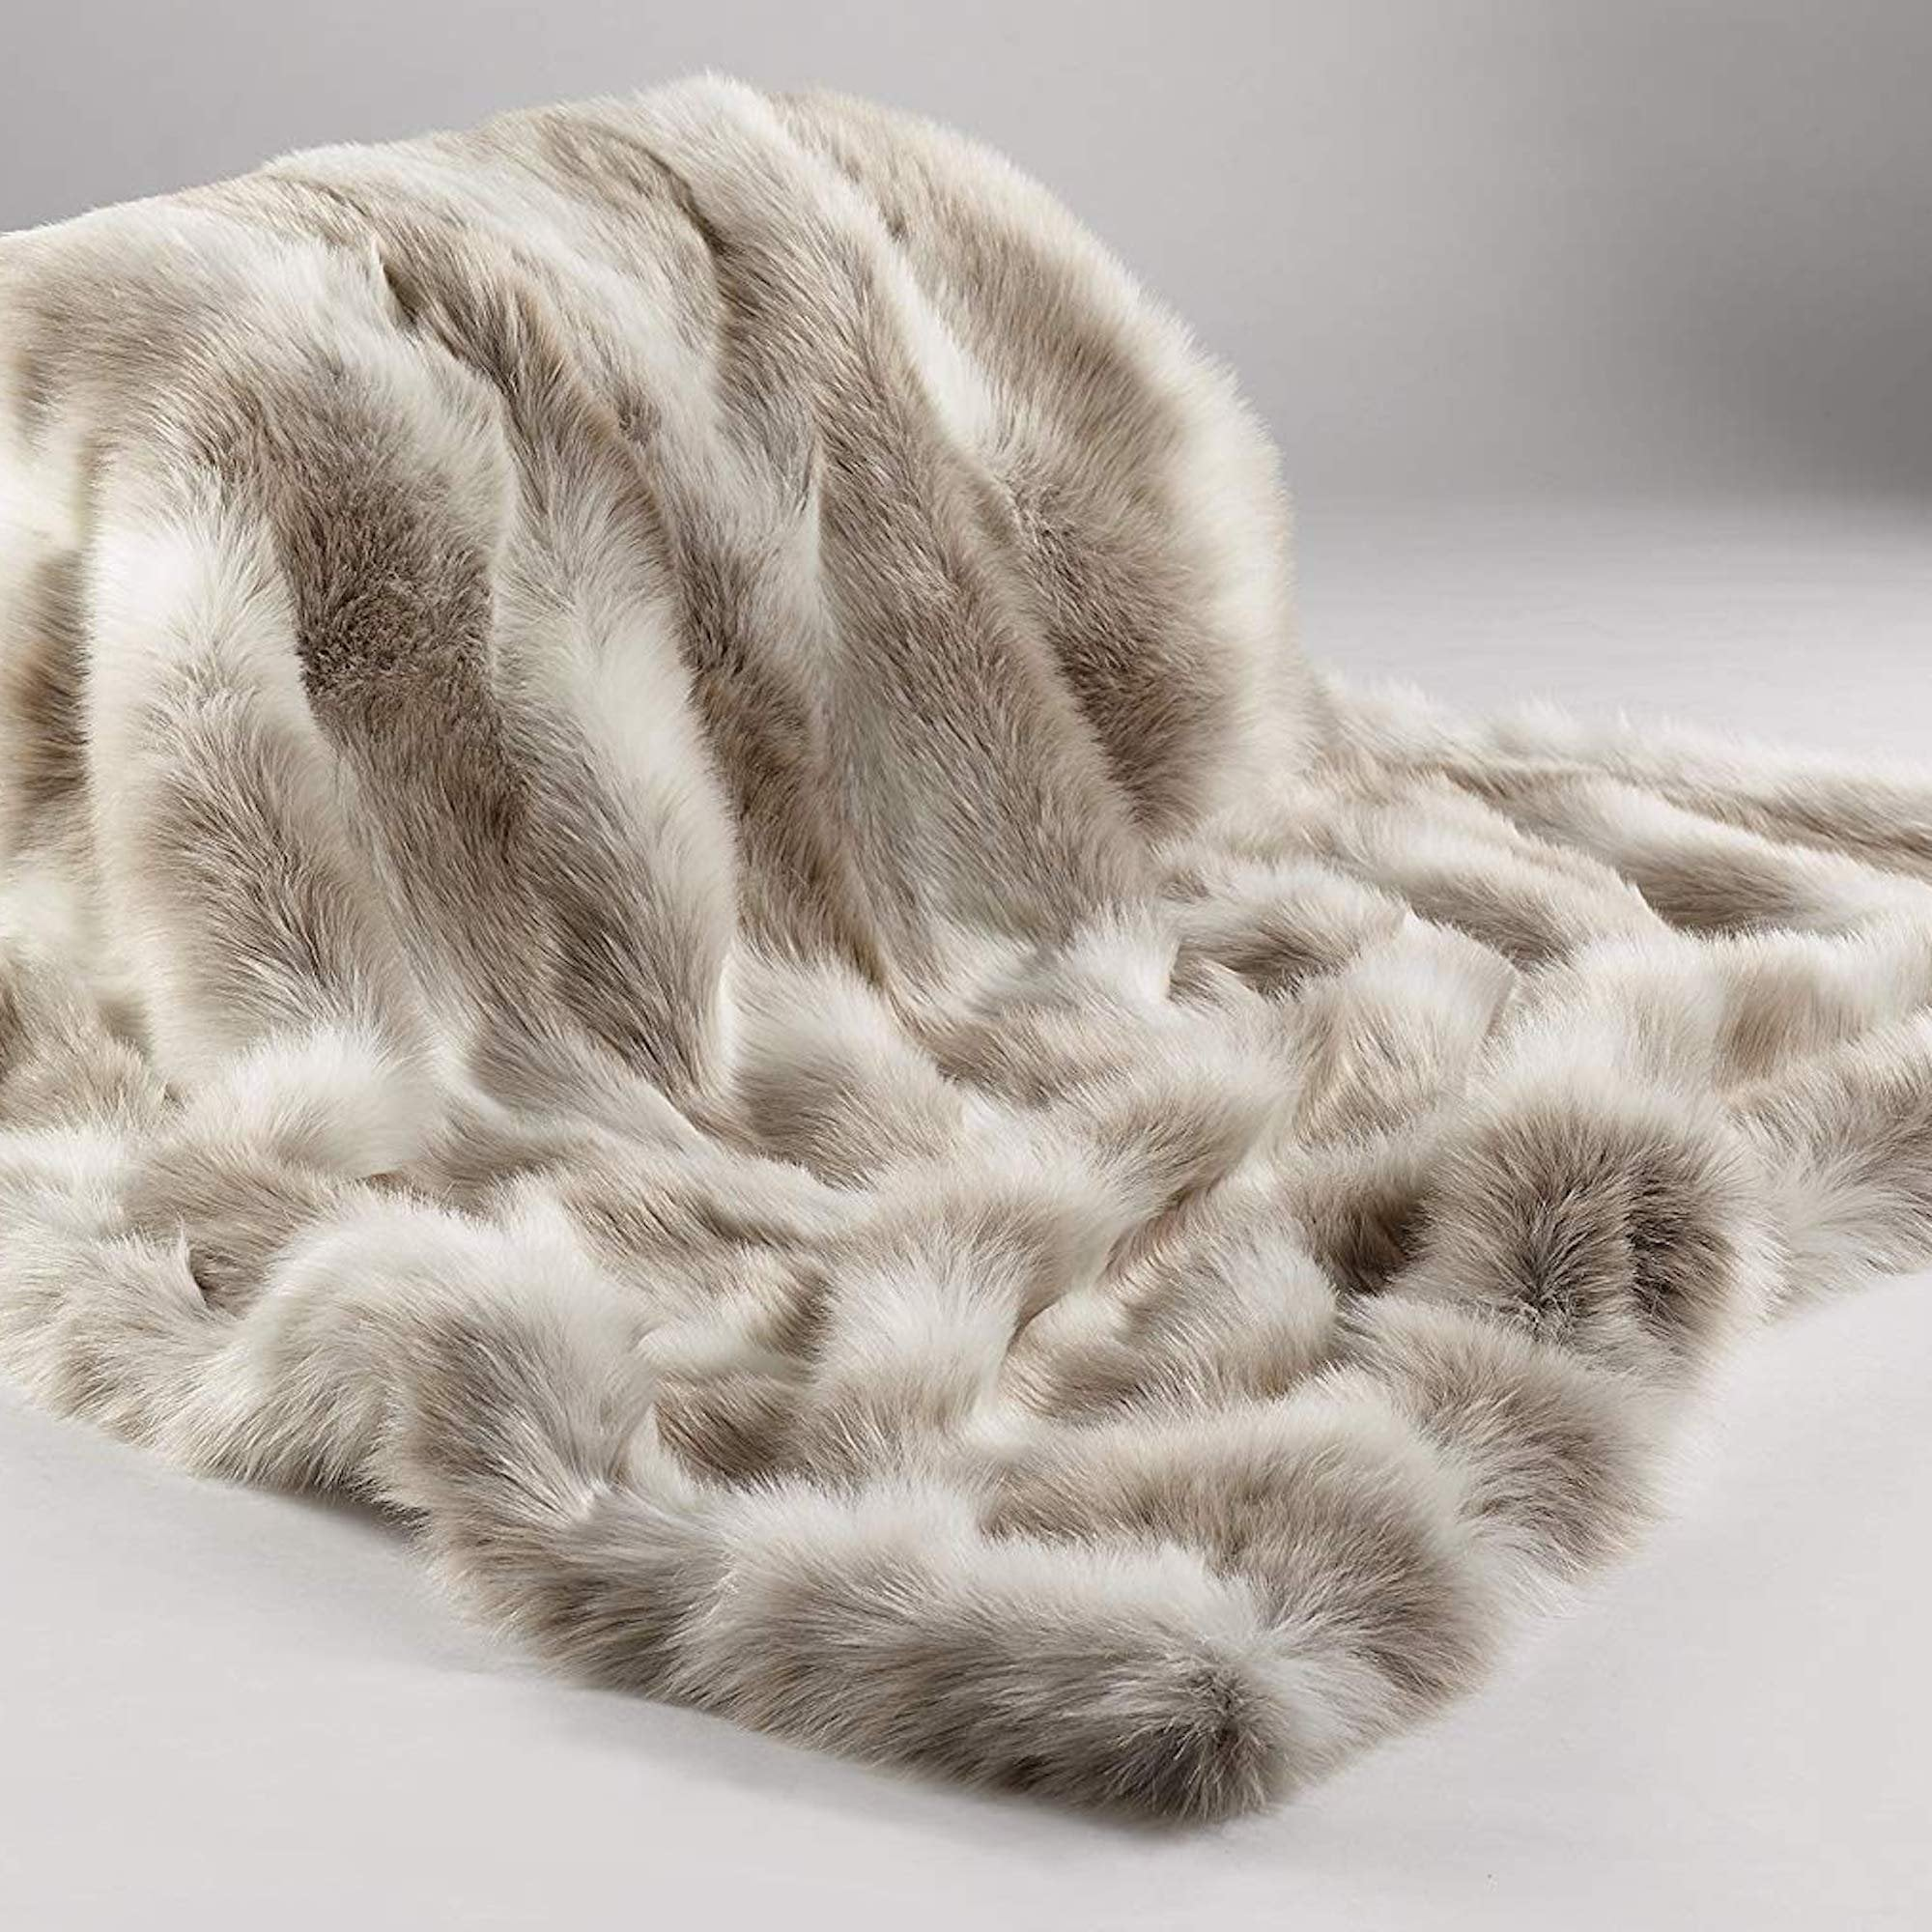 Aspire Interiors Arctic Reindeer Faux Fur Throw Blanket - L   XL fa3617ff53eb8